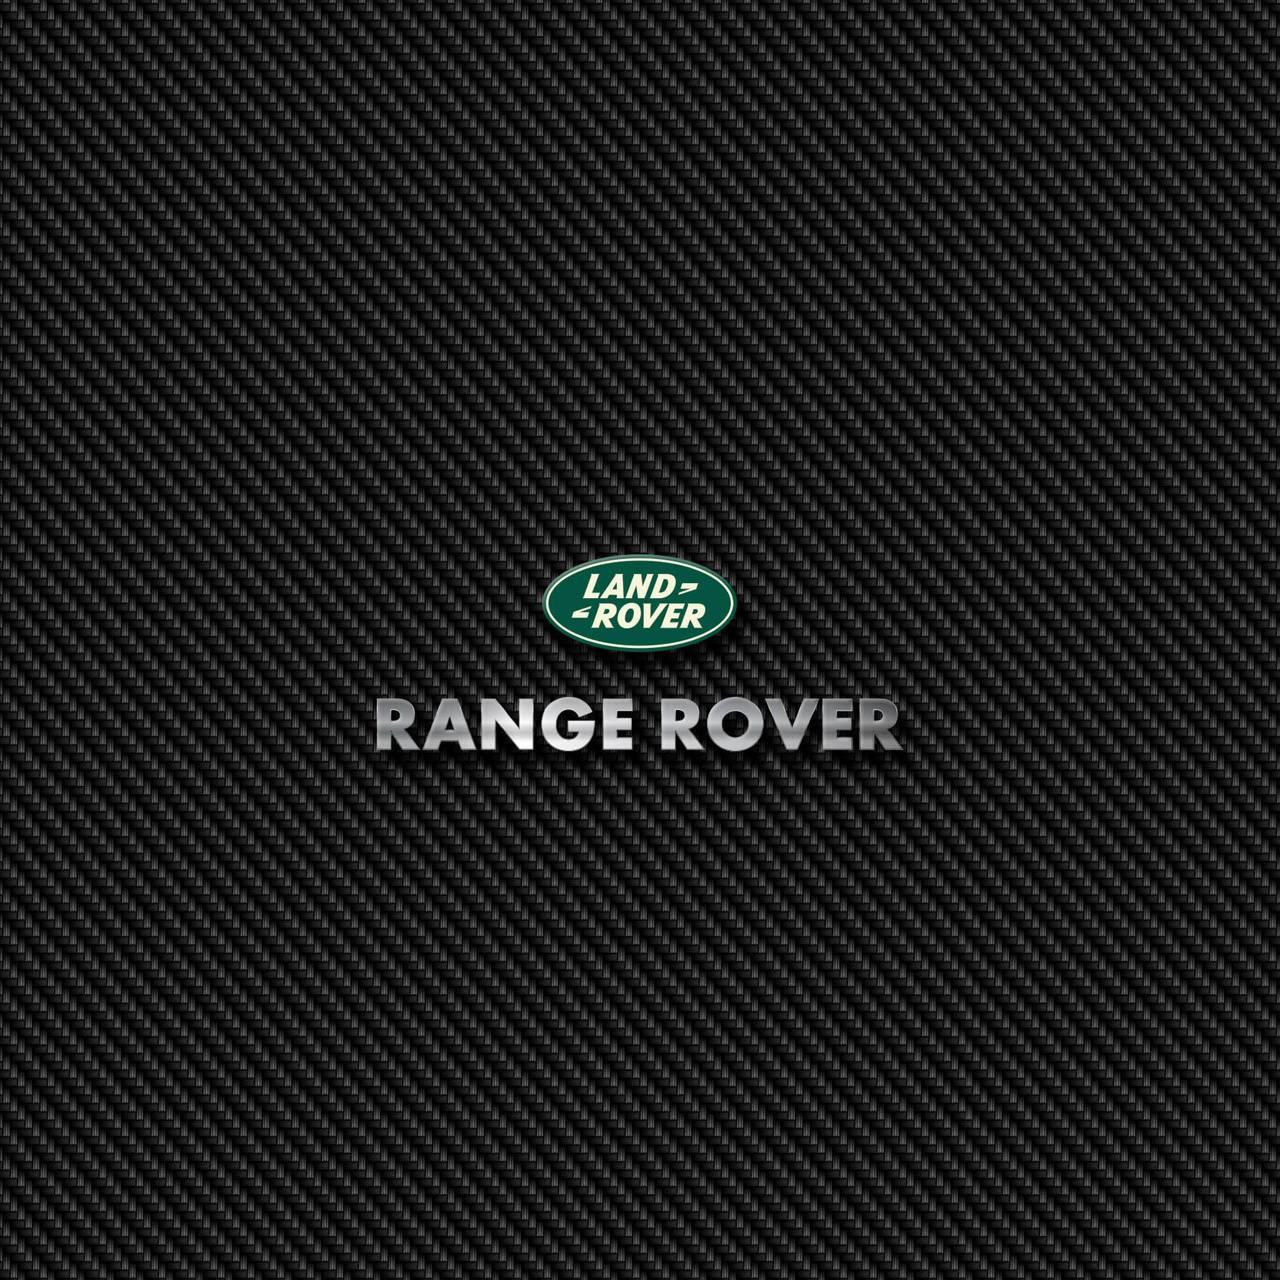 Range Rover Carbon 2